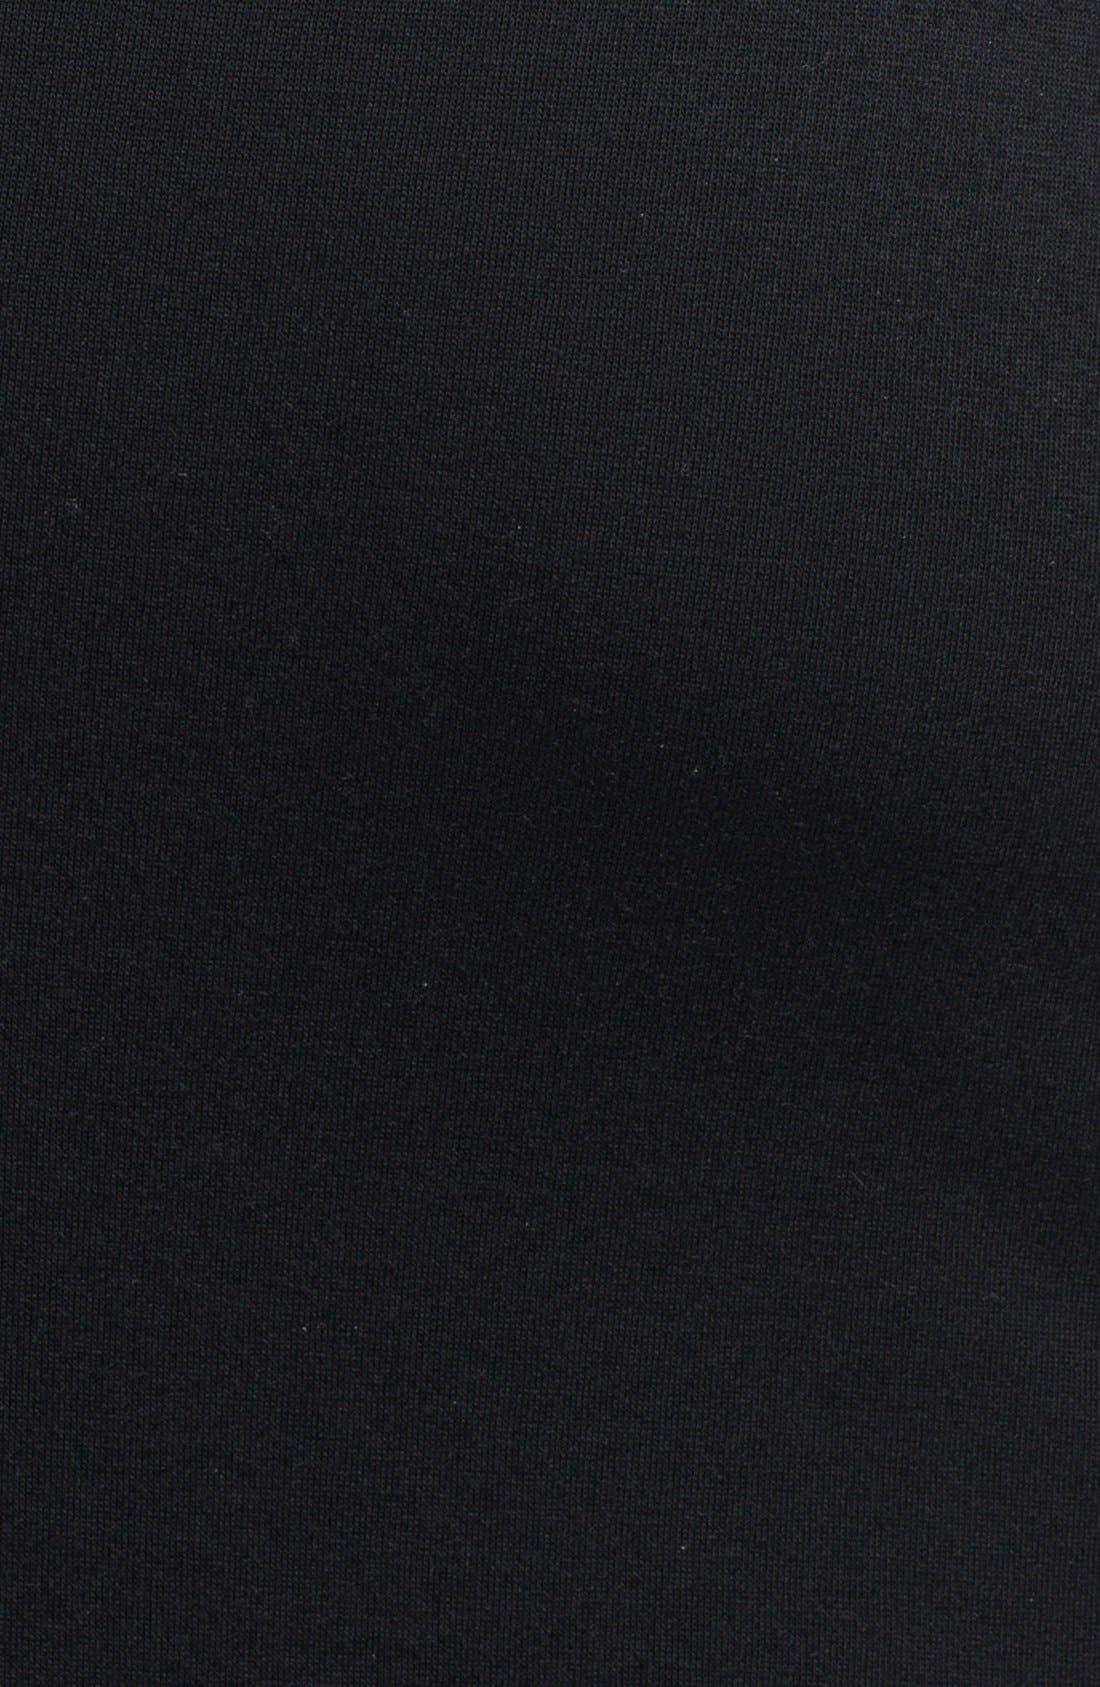 Alternate Image 3  - HELMUT Helmut Lang 'Kinetic' Jersey Maxi Skirt